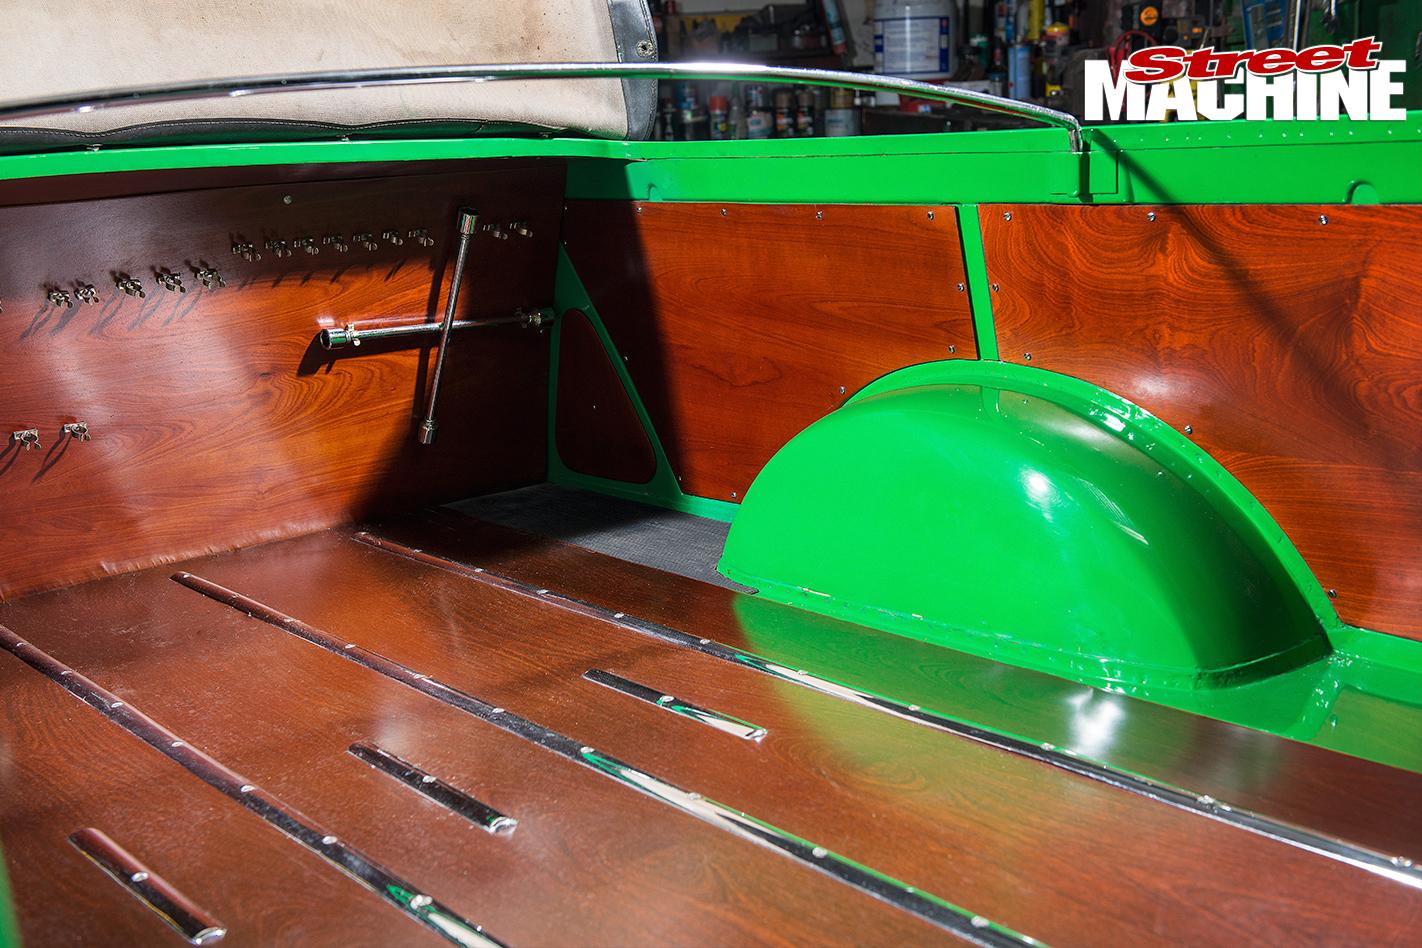 Holden -FJ-Utility -tray -detail